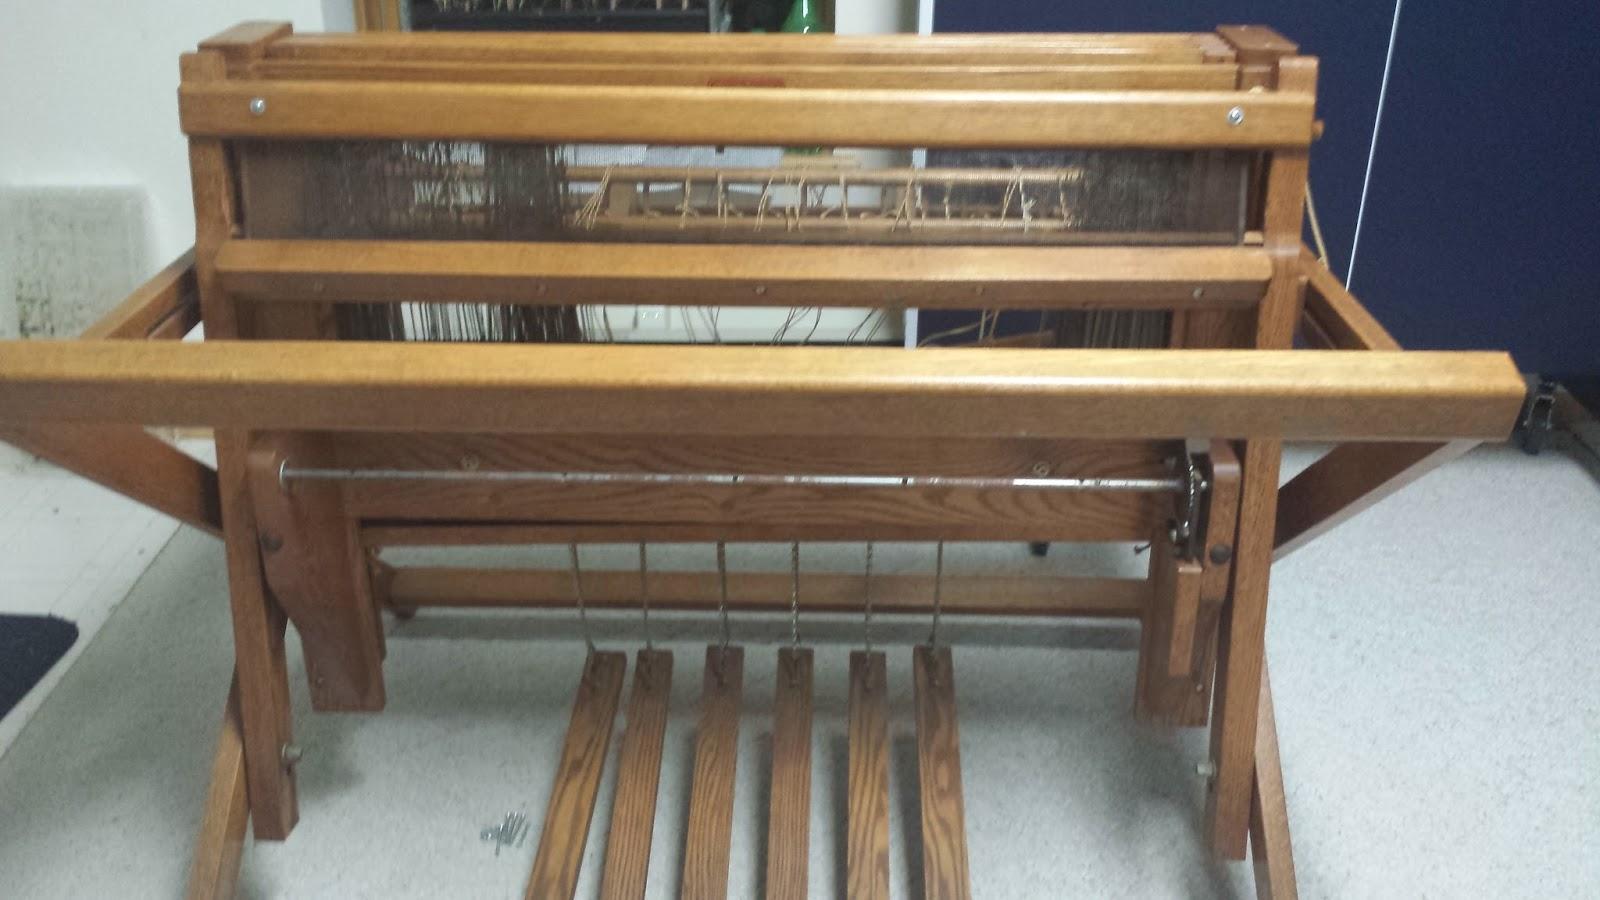 KB Knits & Crafts: Updating my 1960s Kessenich Floor Loom